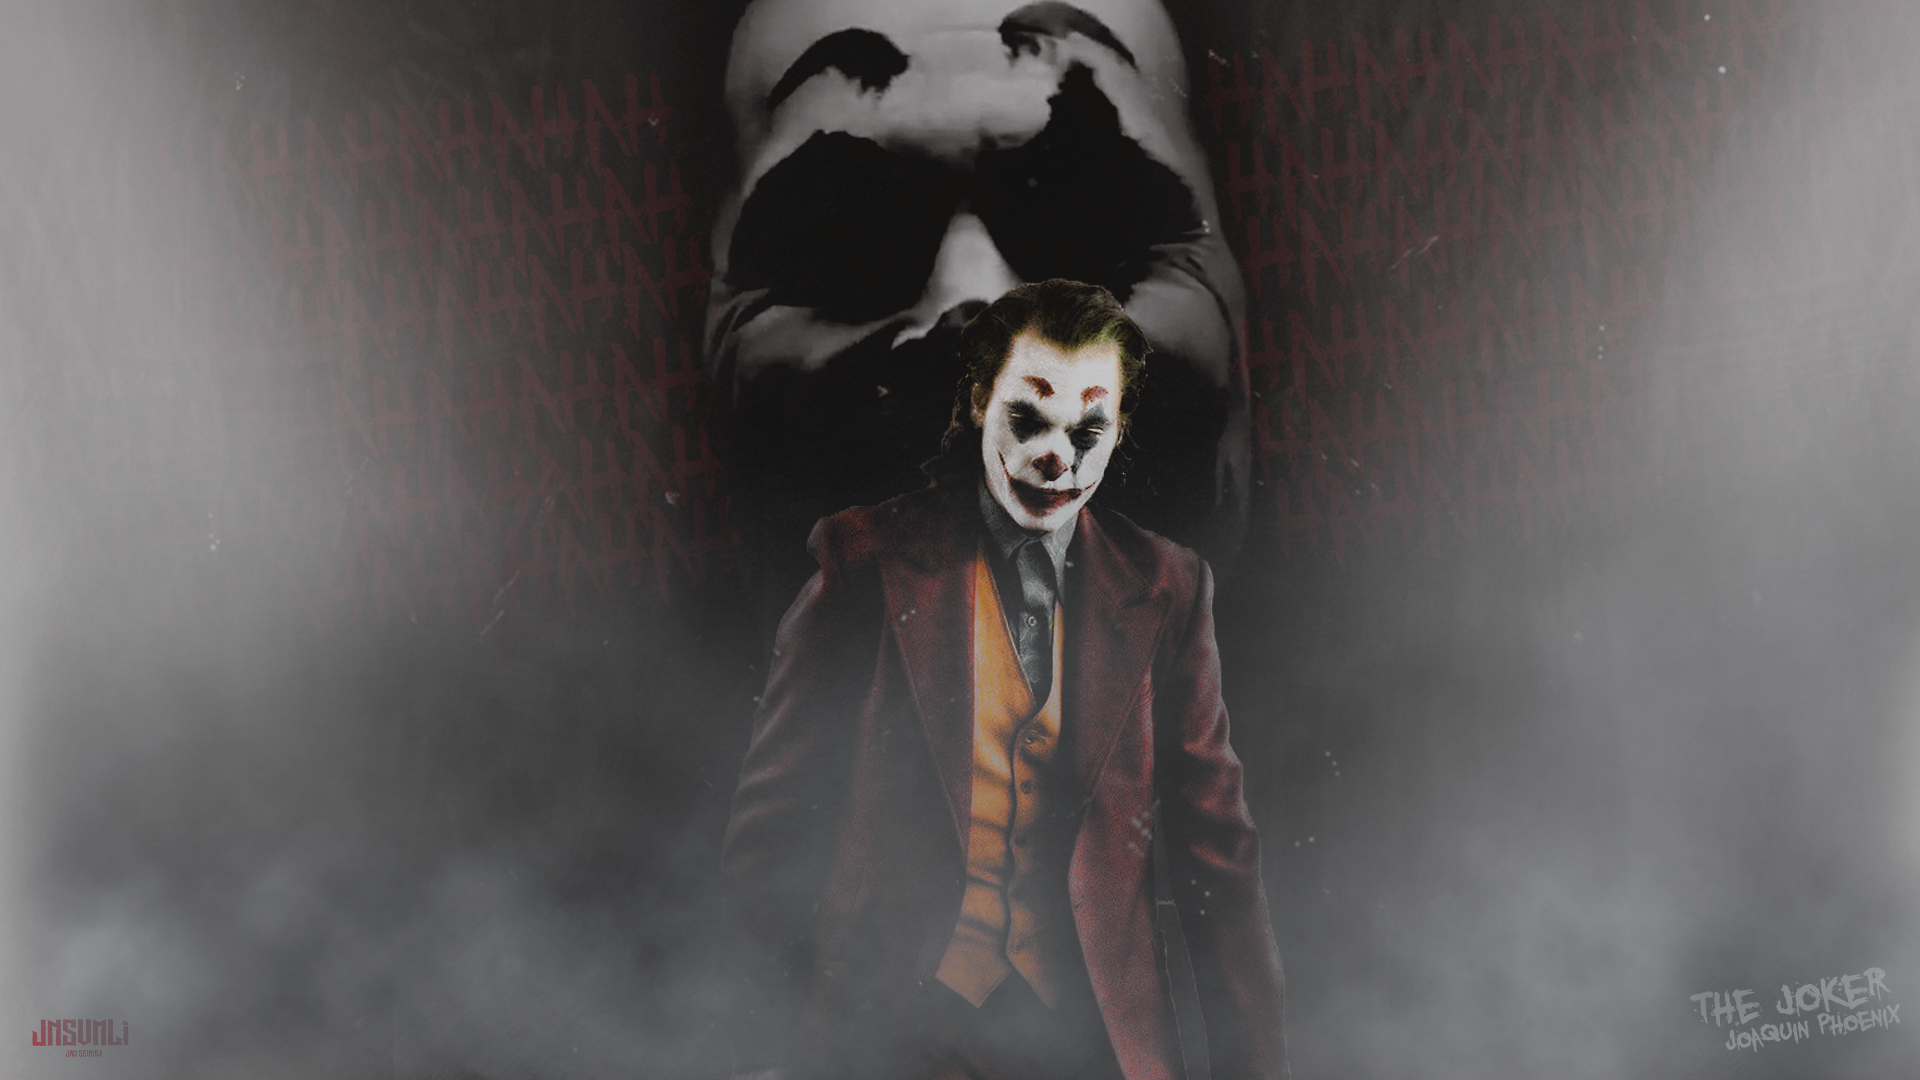 The Joker Joaquin Phoenix Wallpaper Jnsvmli By Jnsvmli